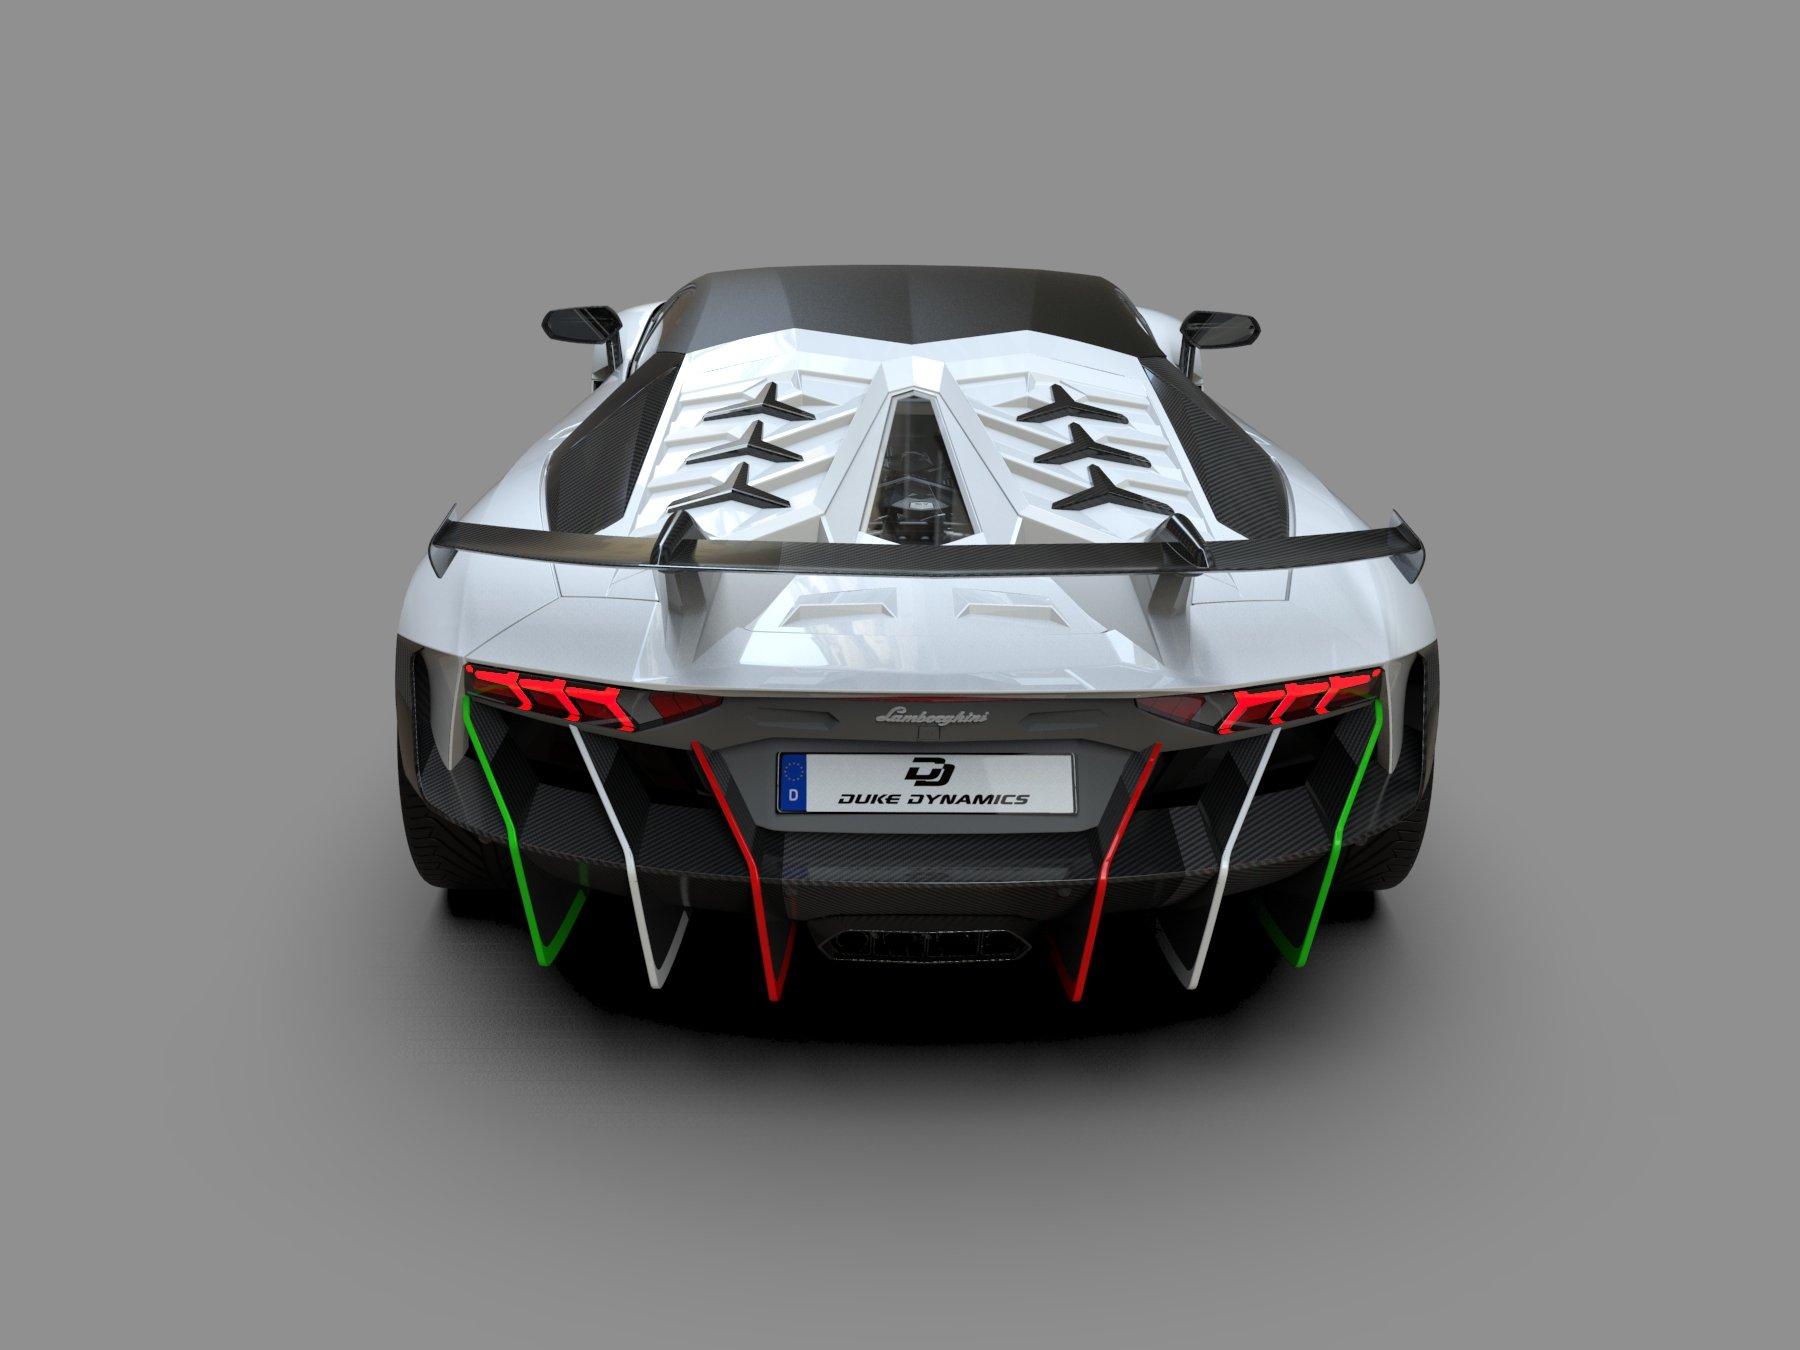 Lamborghini_Aventador_by_Duke_Dynamics_0018